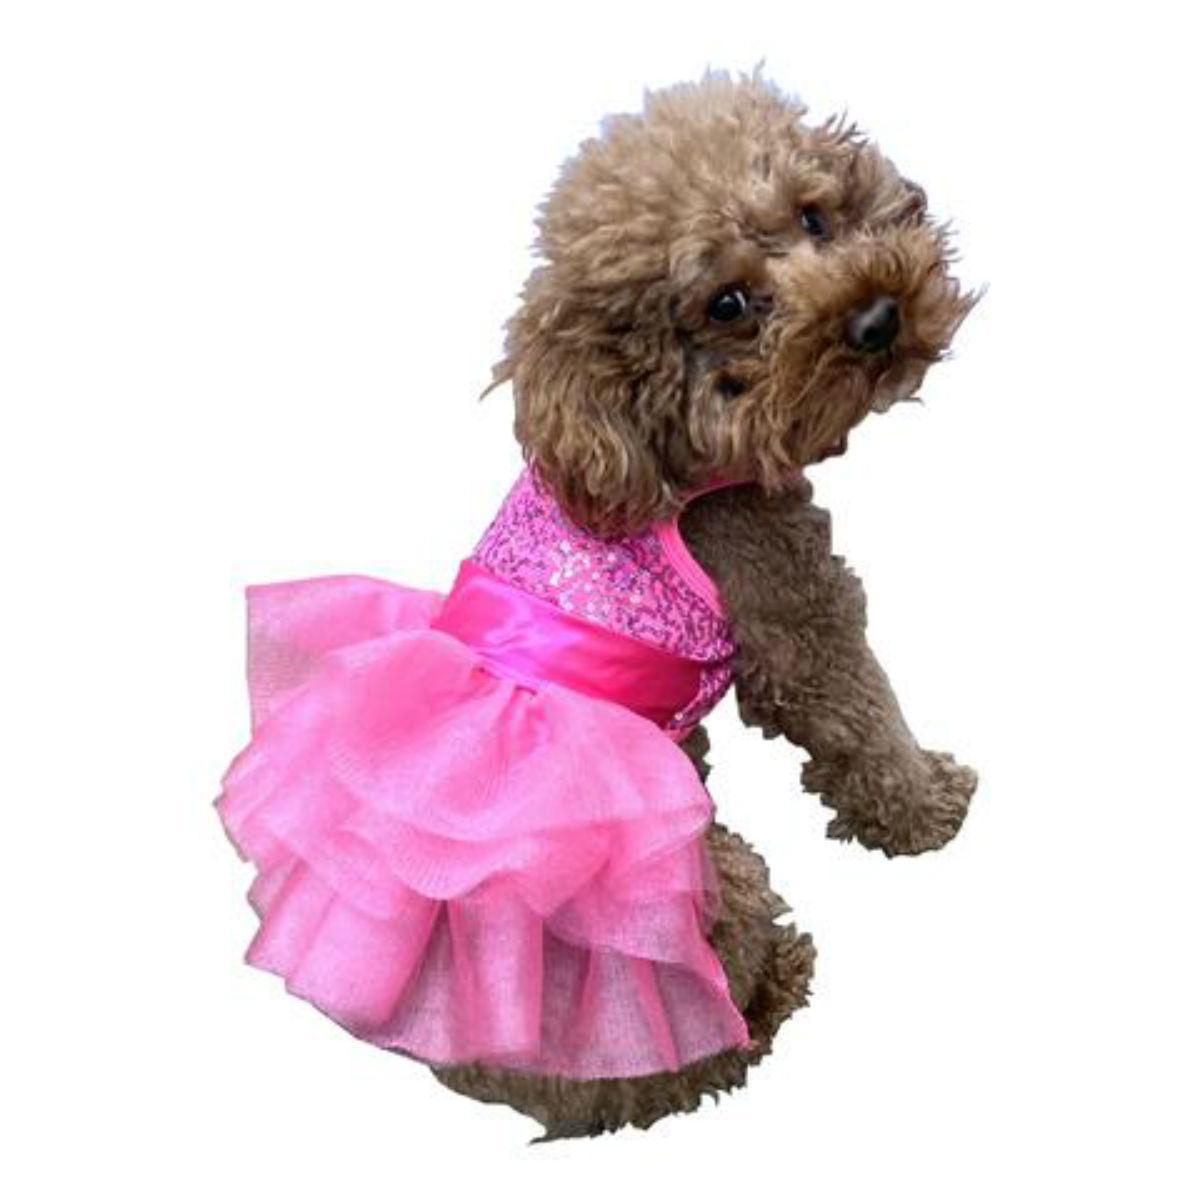 The Dog Squad's Fufu Tutu Zsa Zsa Sequin Dog Dress - Hot Pink